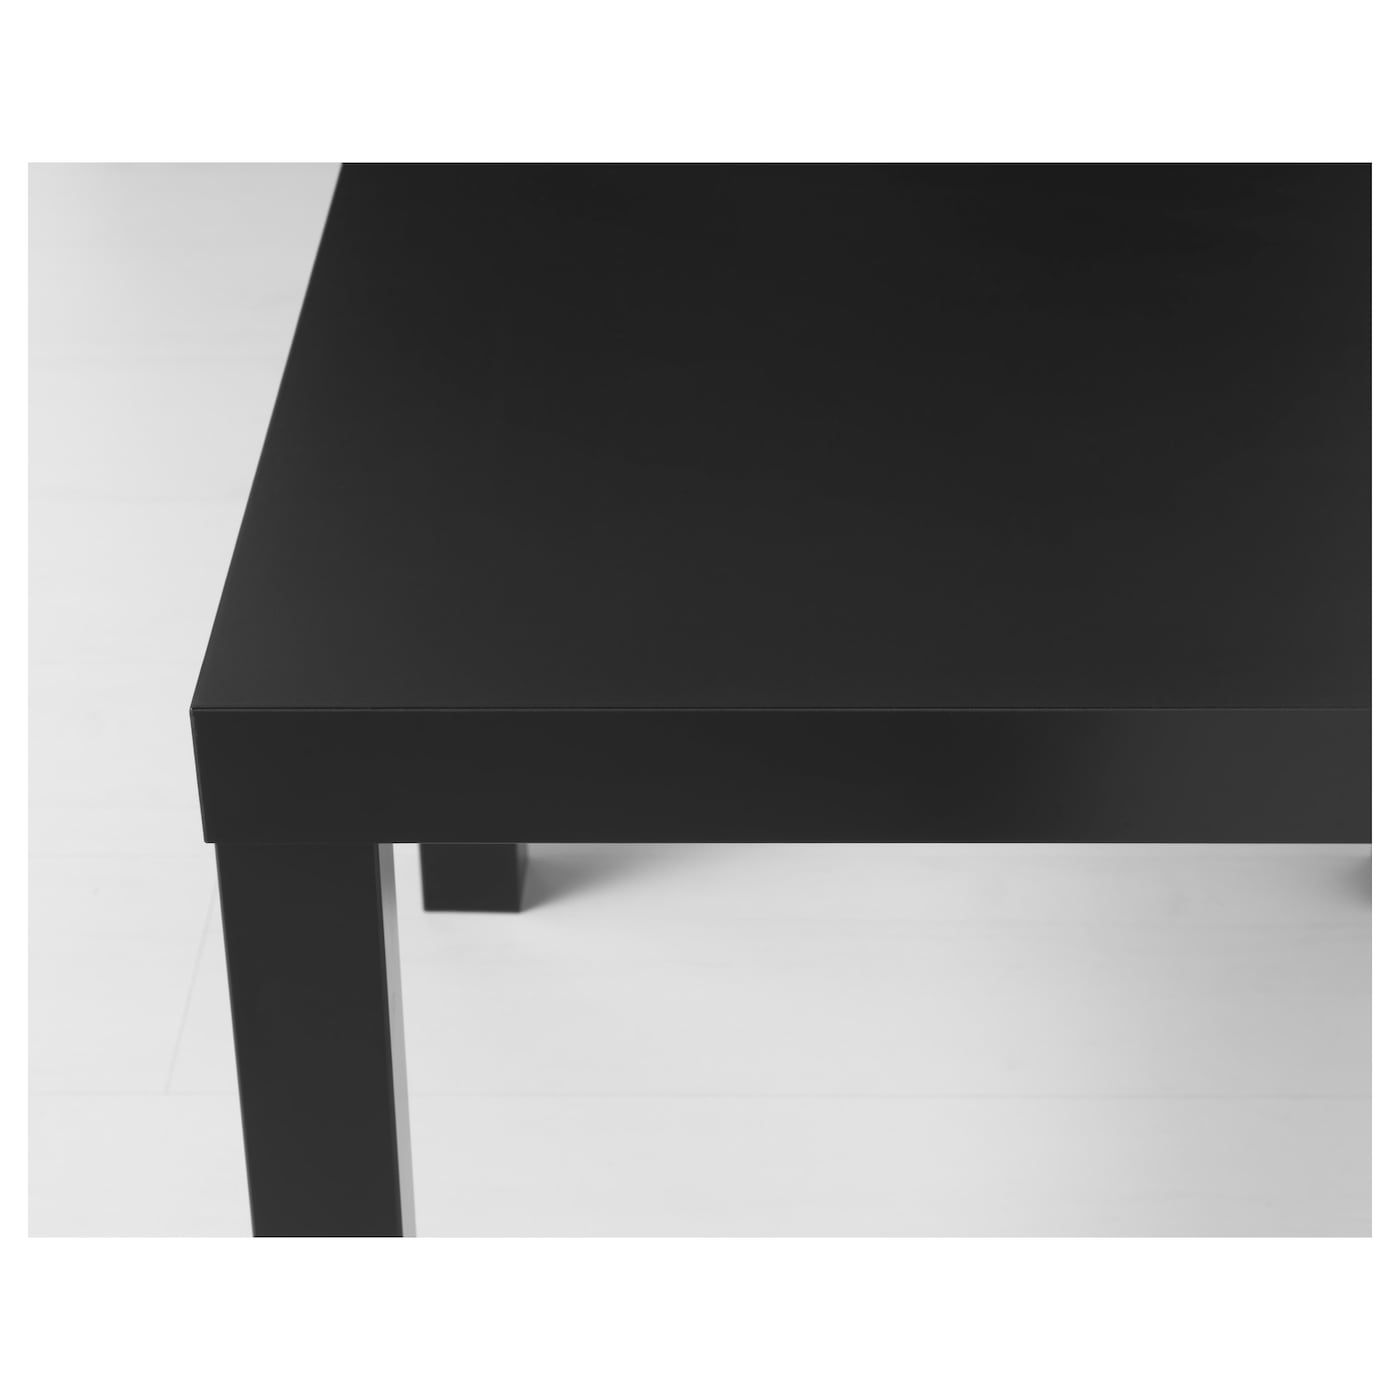 Lack Side Table Black 22x22 55x55 Cm Ikea Ikea Lack Coffee Table Black Side Table Ikea Lack Side Table [ 1400 x 1400 Pixel ]